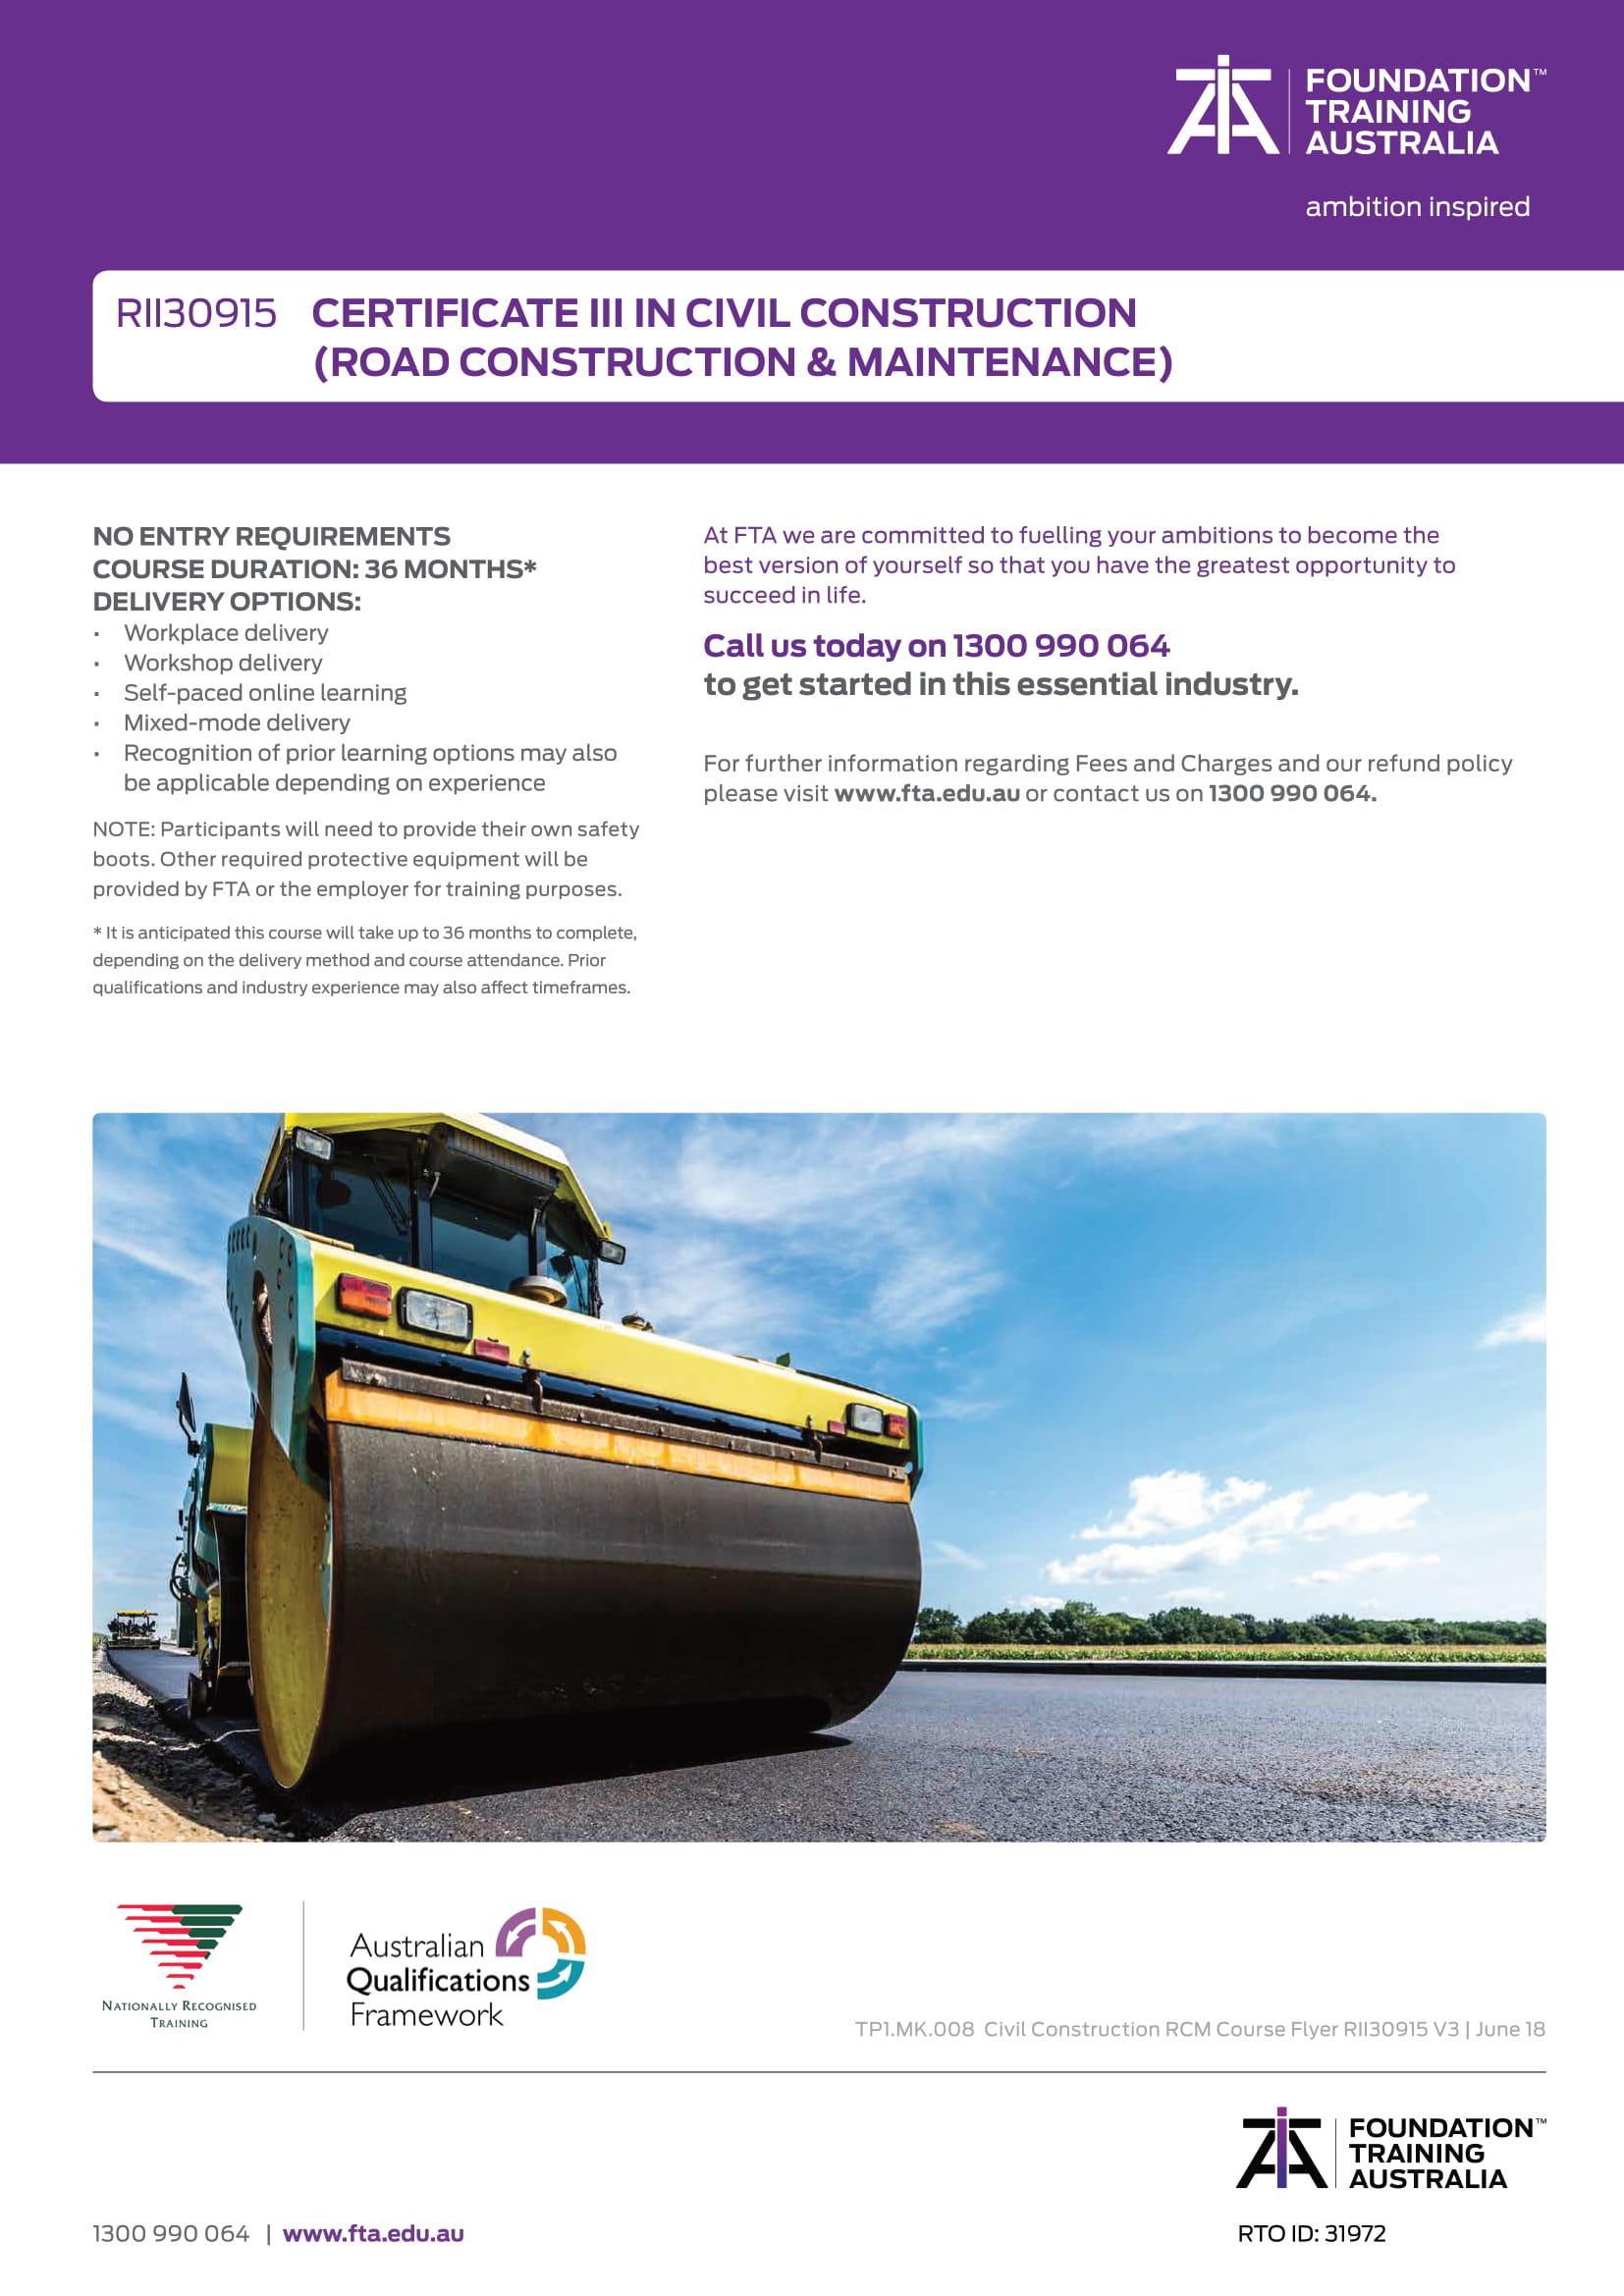 https://www.fta.edu.au/wp-content/uploads/2020/06/TP1.MK_.008-Civil-Construction-RCM-Course-Flyer-RII30915-V3-_-June-18-DIGITAL-1-2.jpg